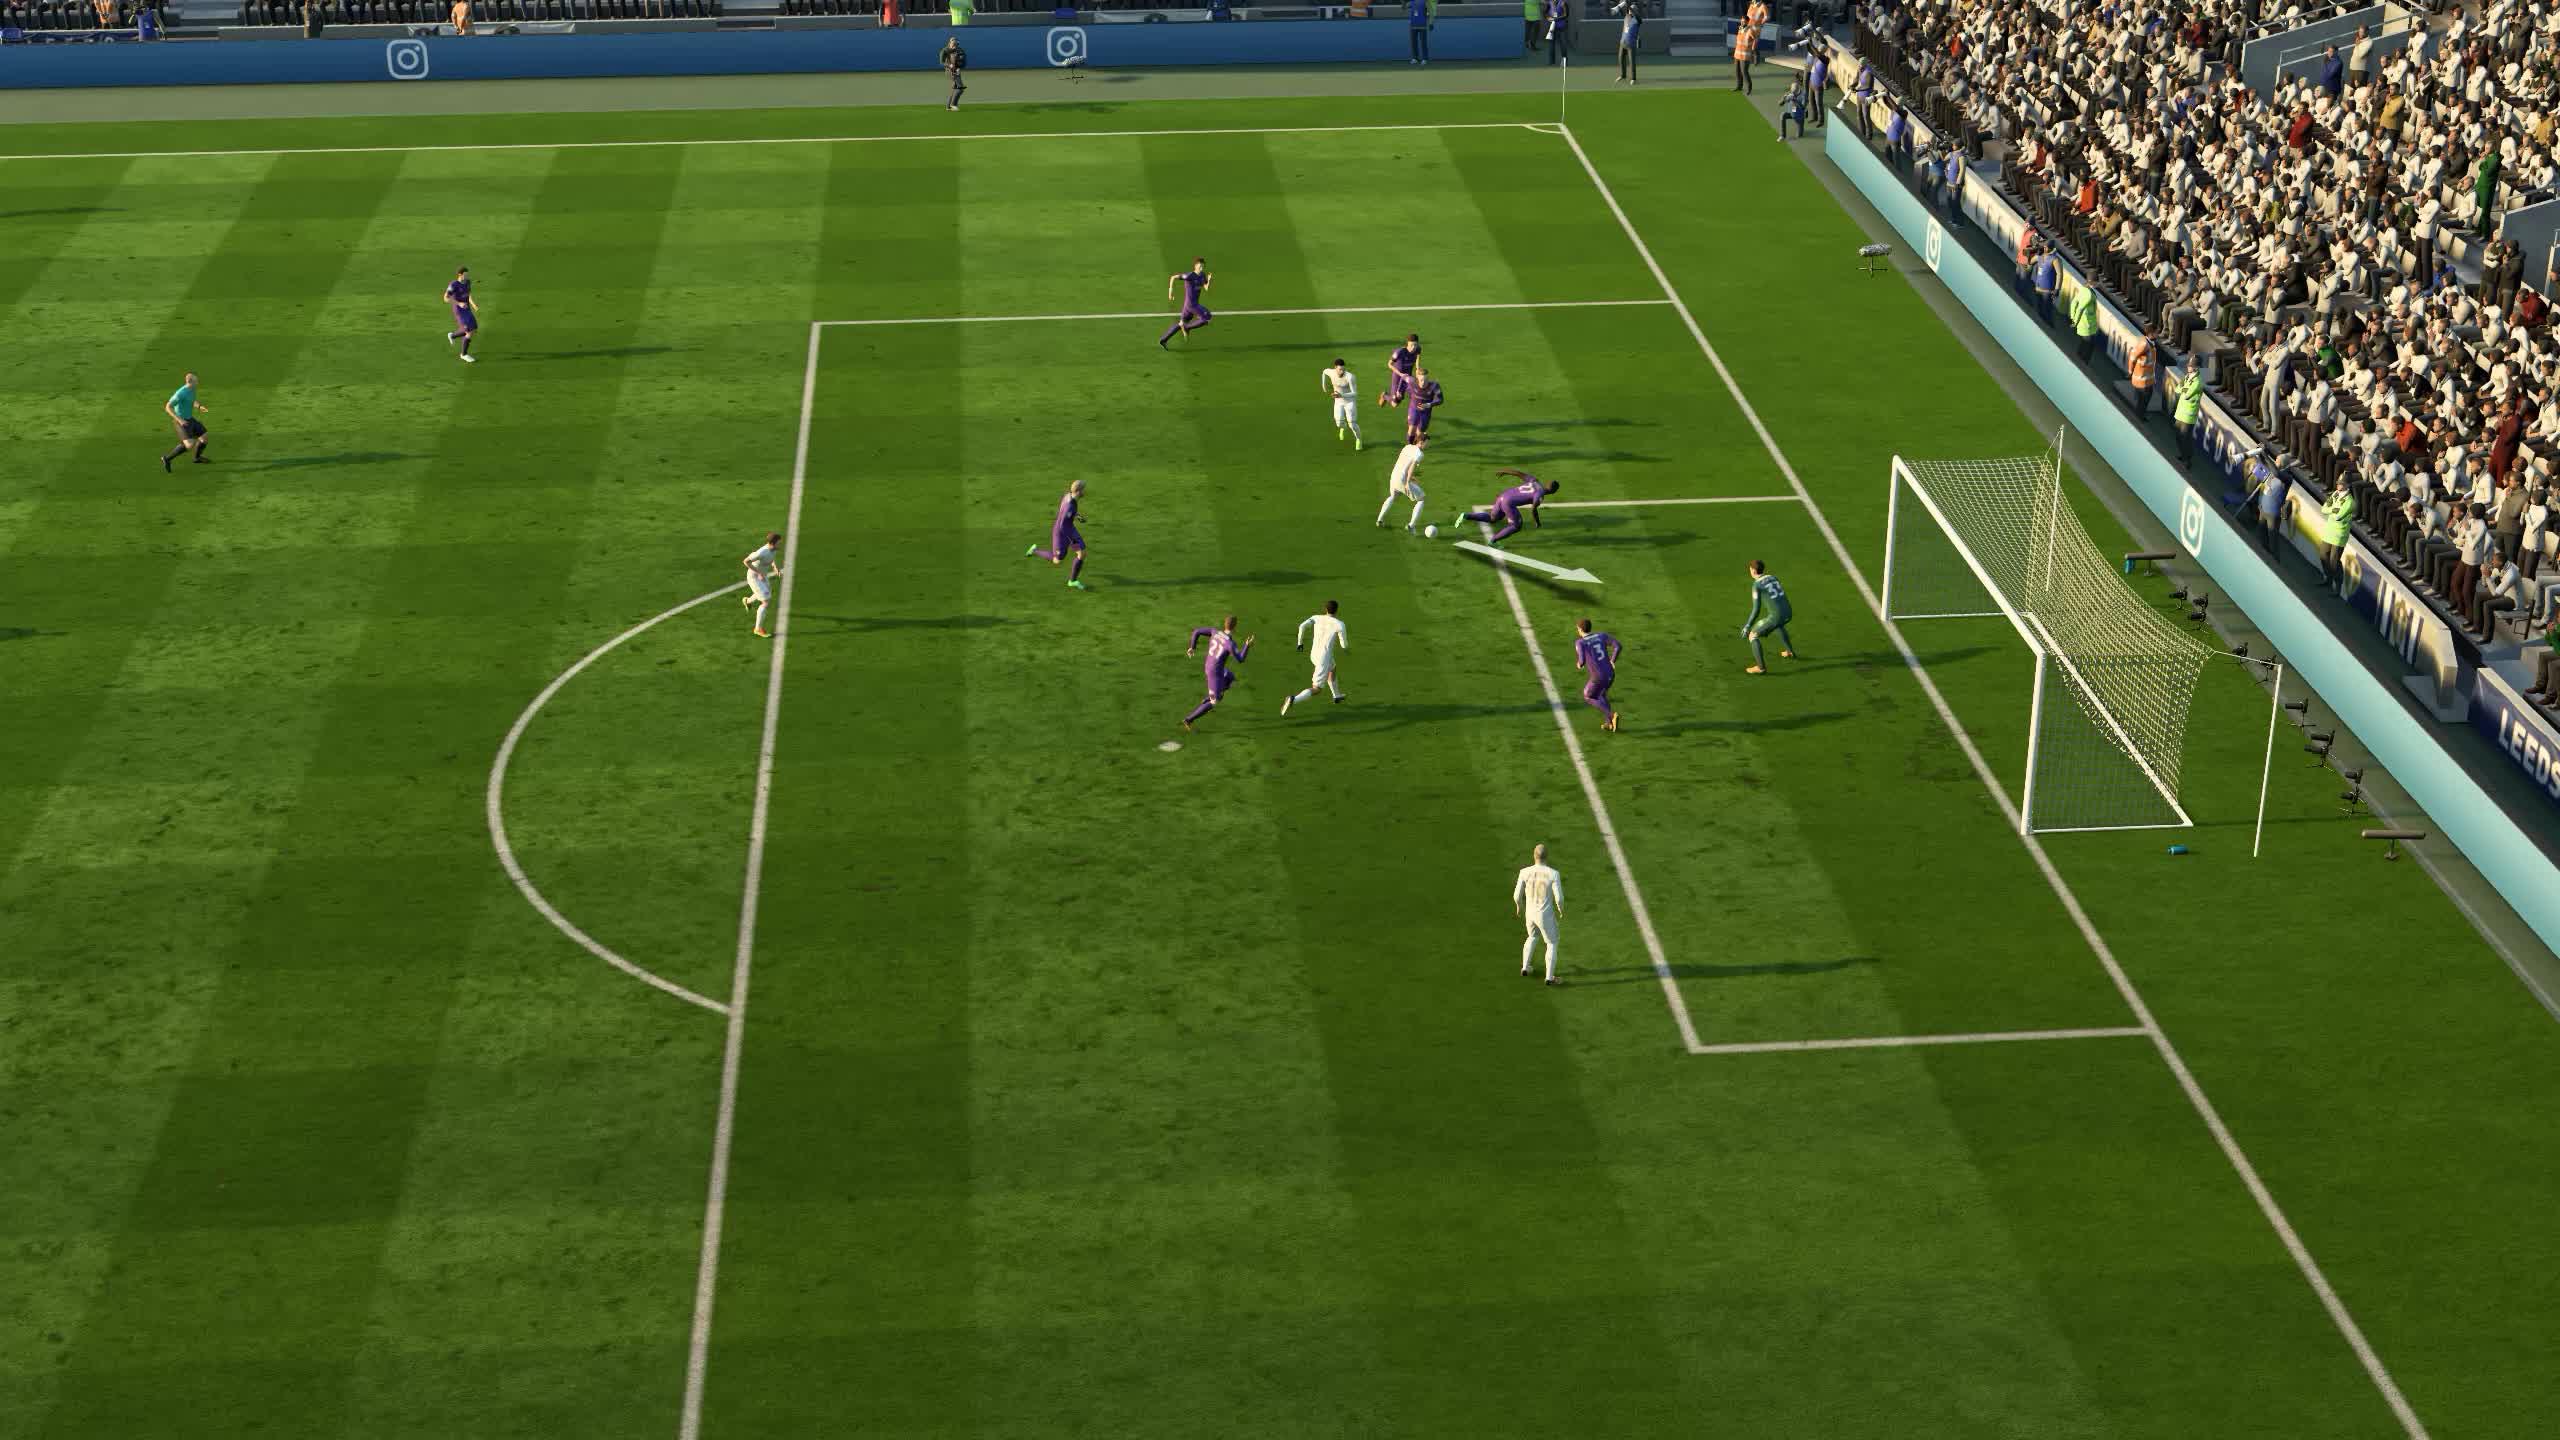 fifa, goalkeepers nightmare GIFs